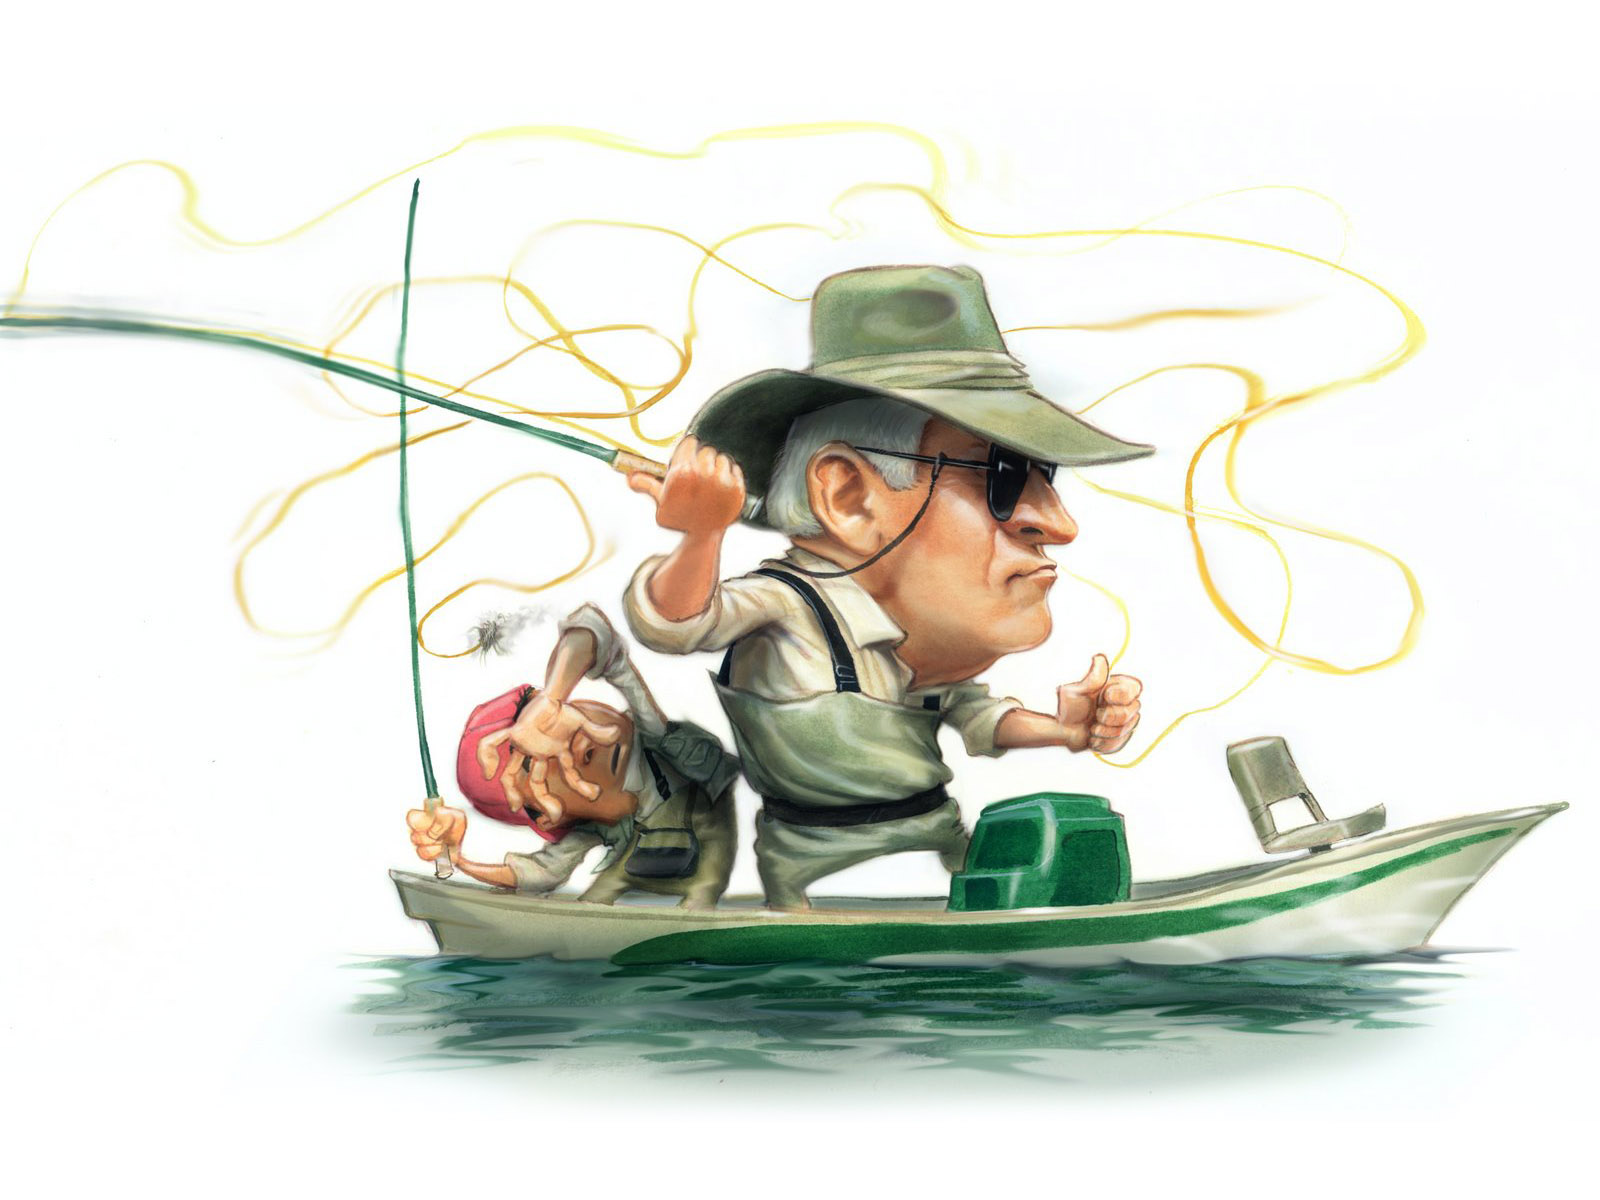 Cartoons Humor Fishing Sports Wallpaper 1600x1200 46514 Wallpaperup